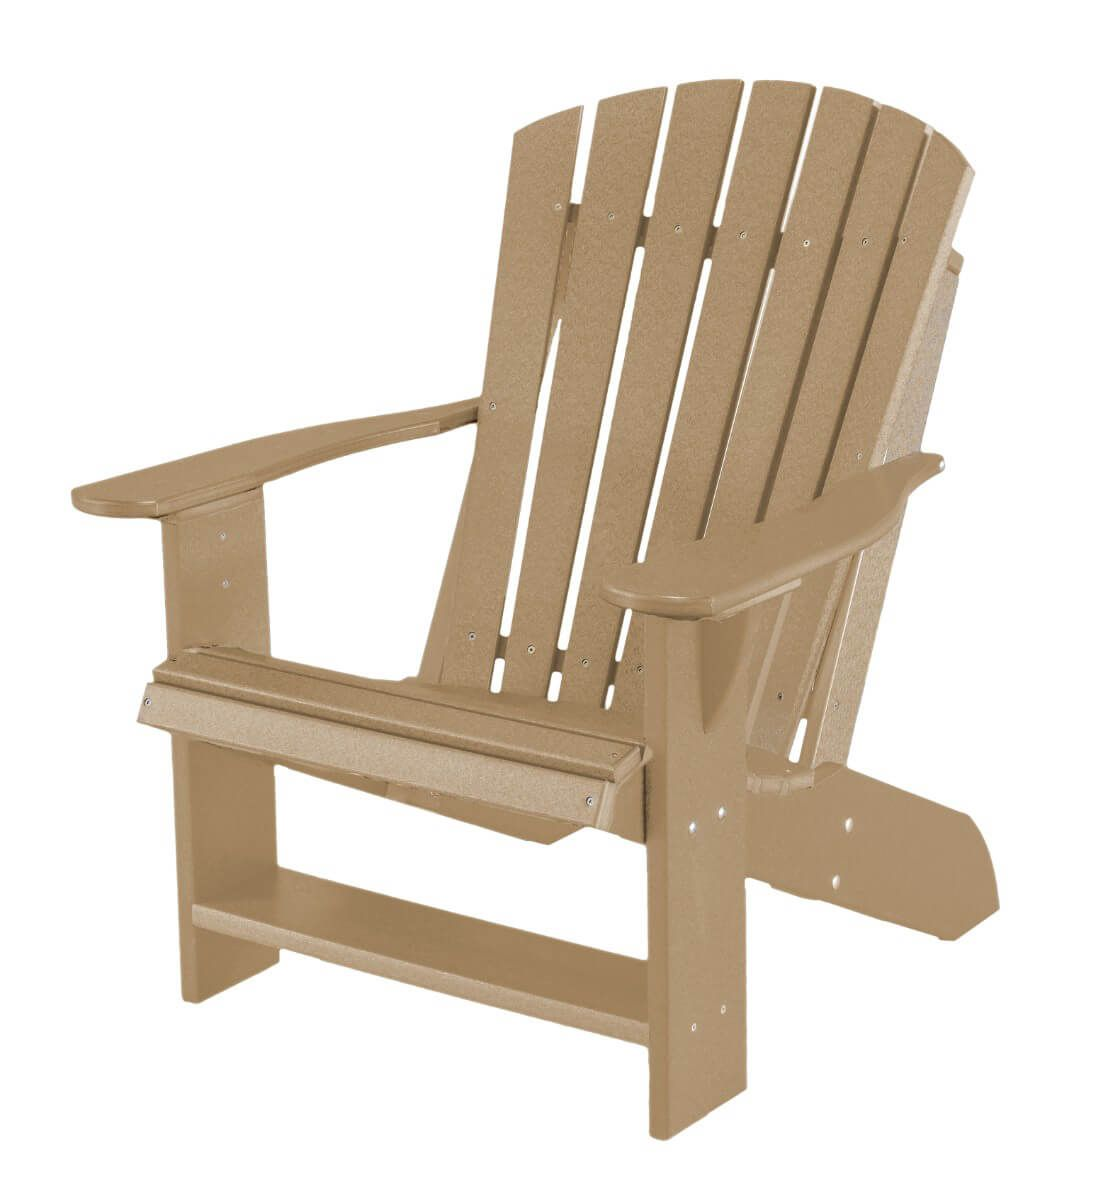 Weathered Wood Sidra Adirondack Chair